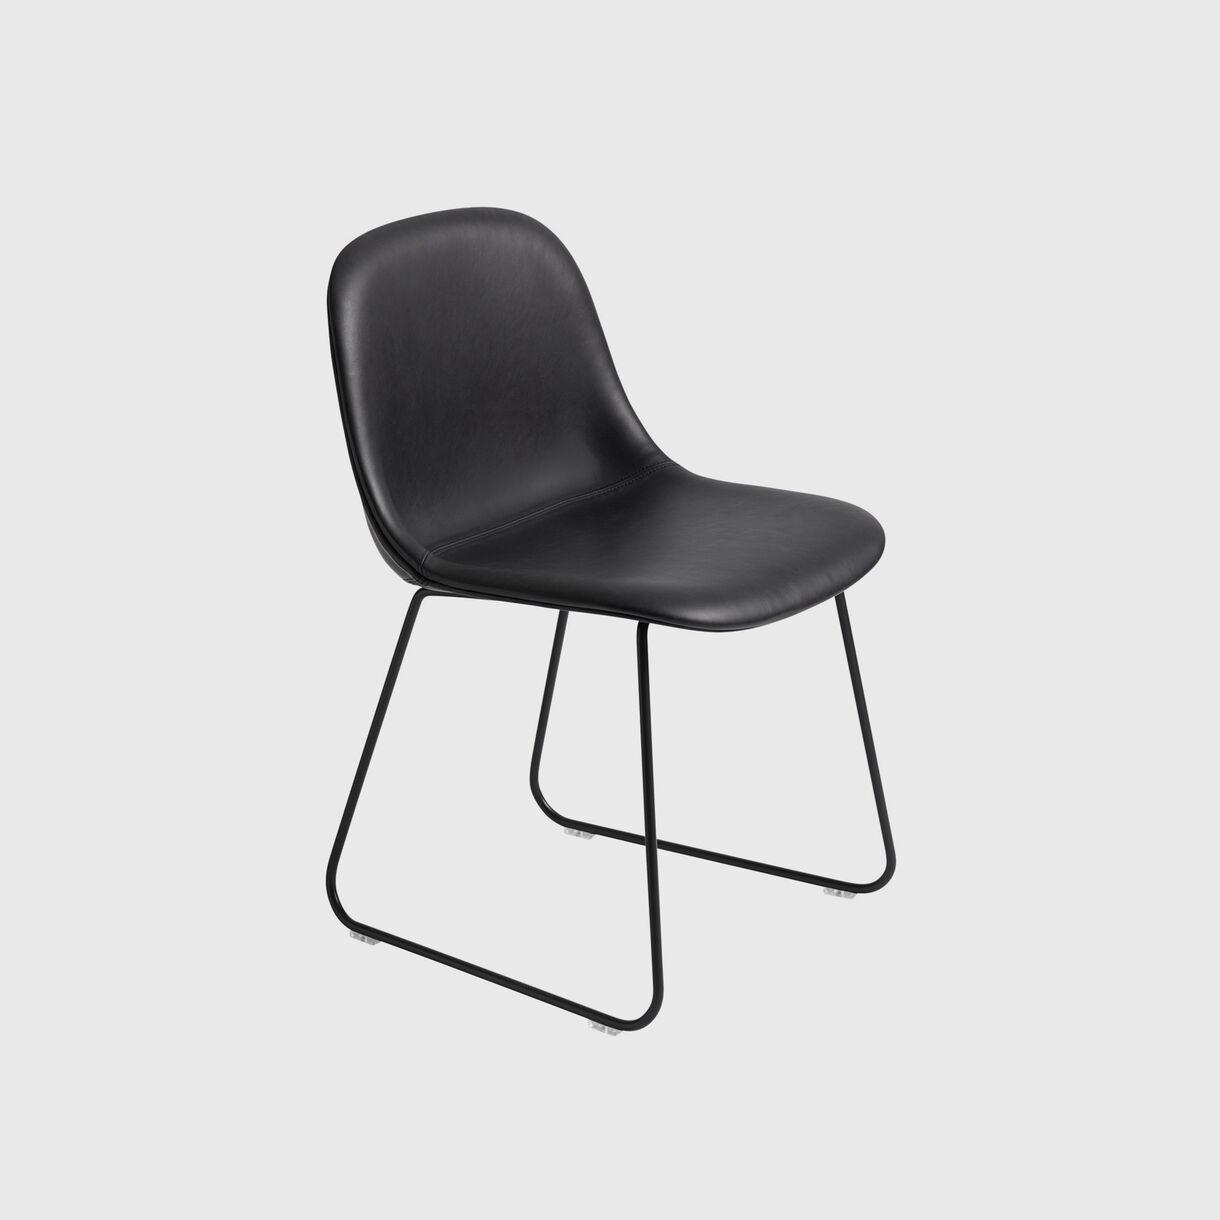 Fiber Side Chair Sled Base, Upholstered, Black Leather